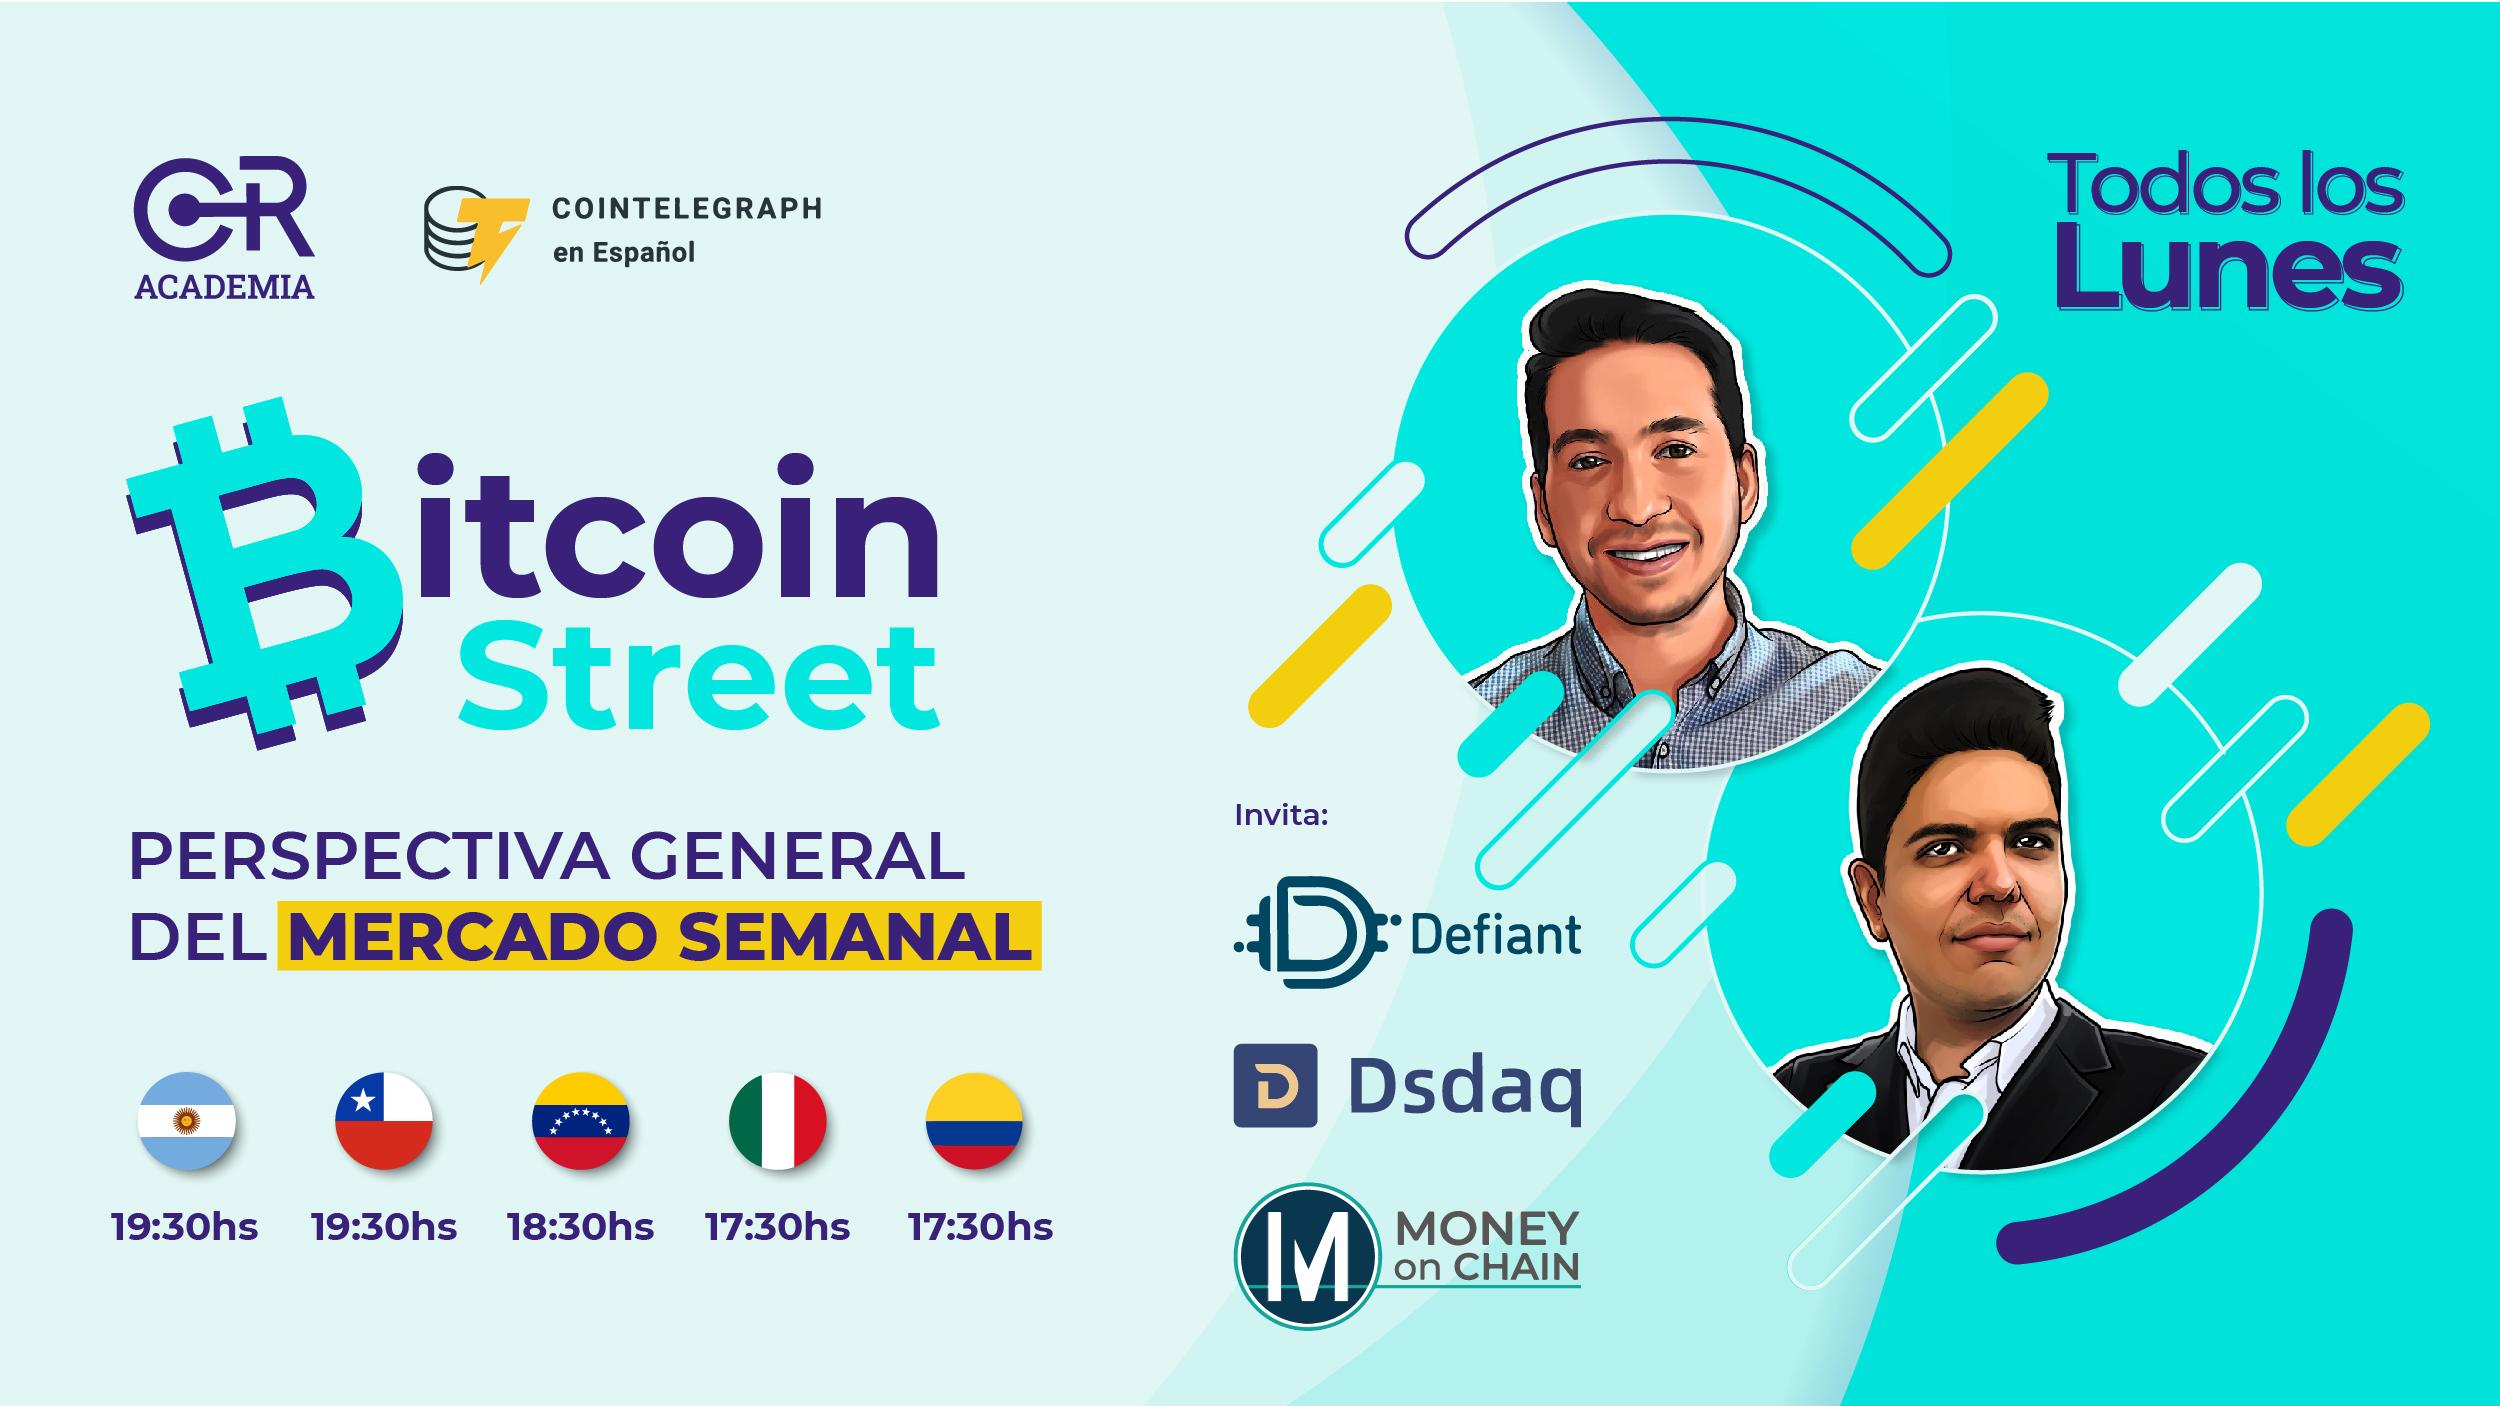 Bitcoin Street Semana 08/02/2021 - 14/02/2021